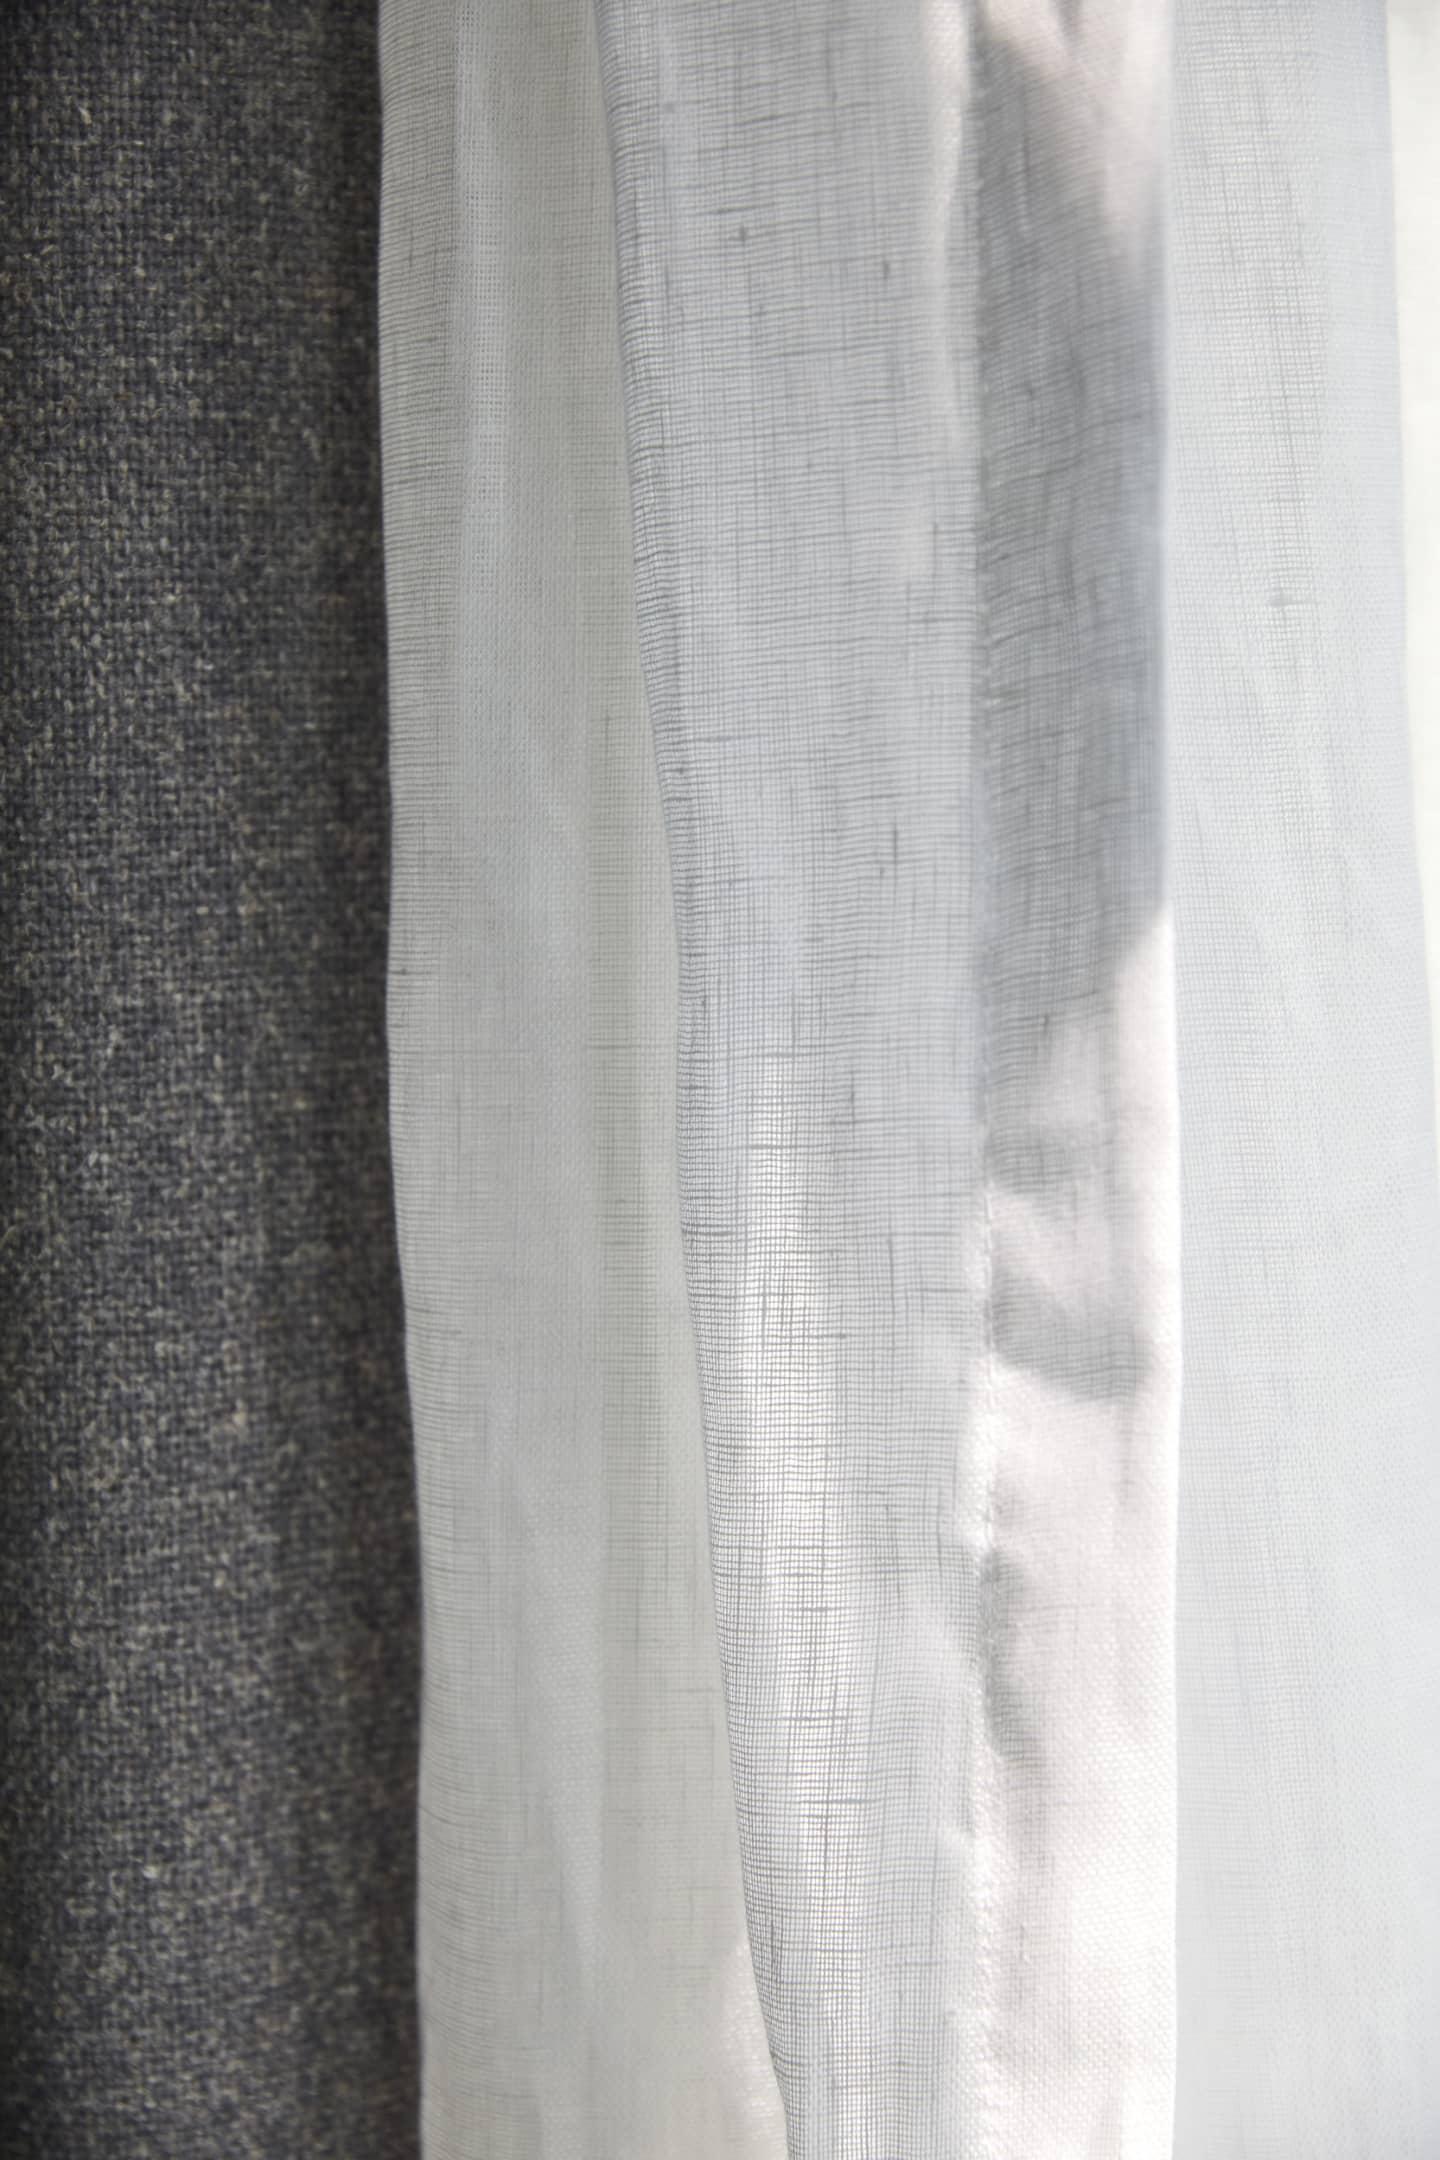 close up of grey curtain stitching